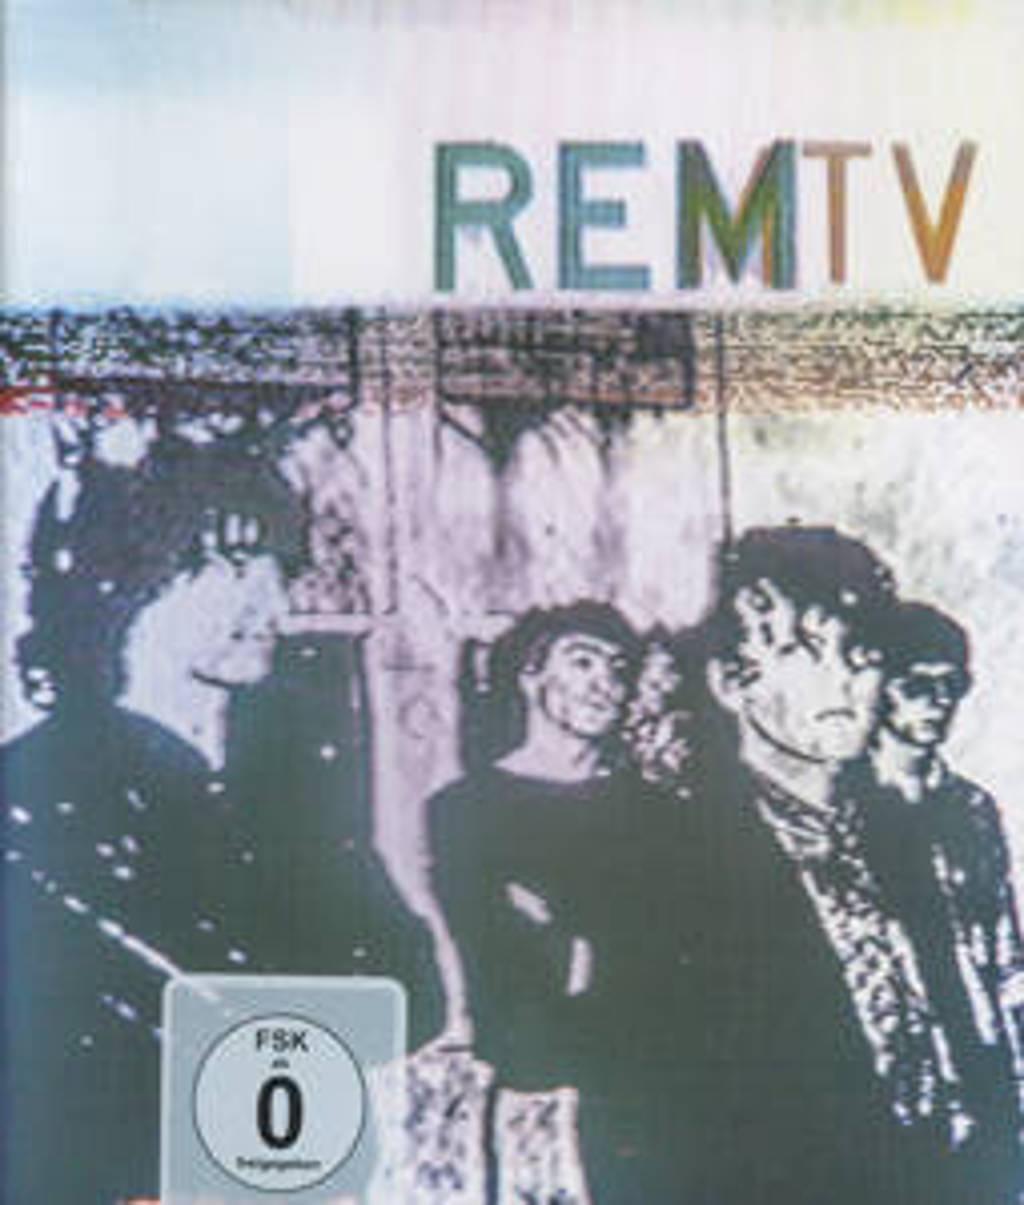 R.E.M. - Remtv (DVD)